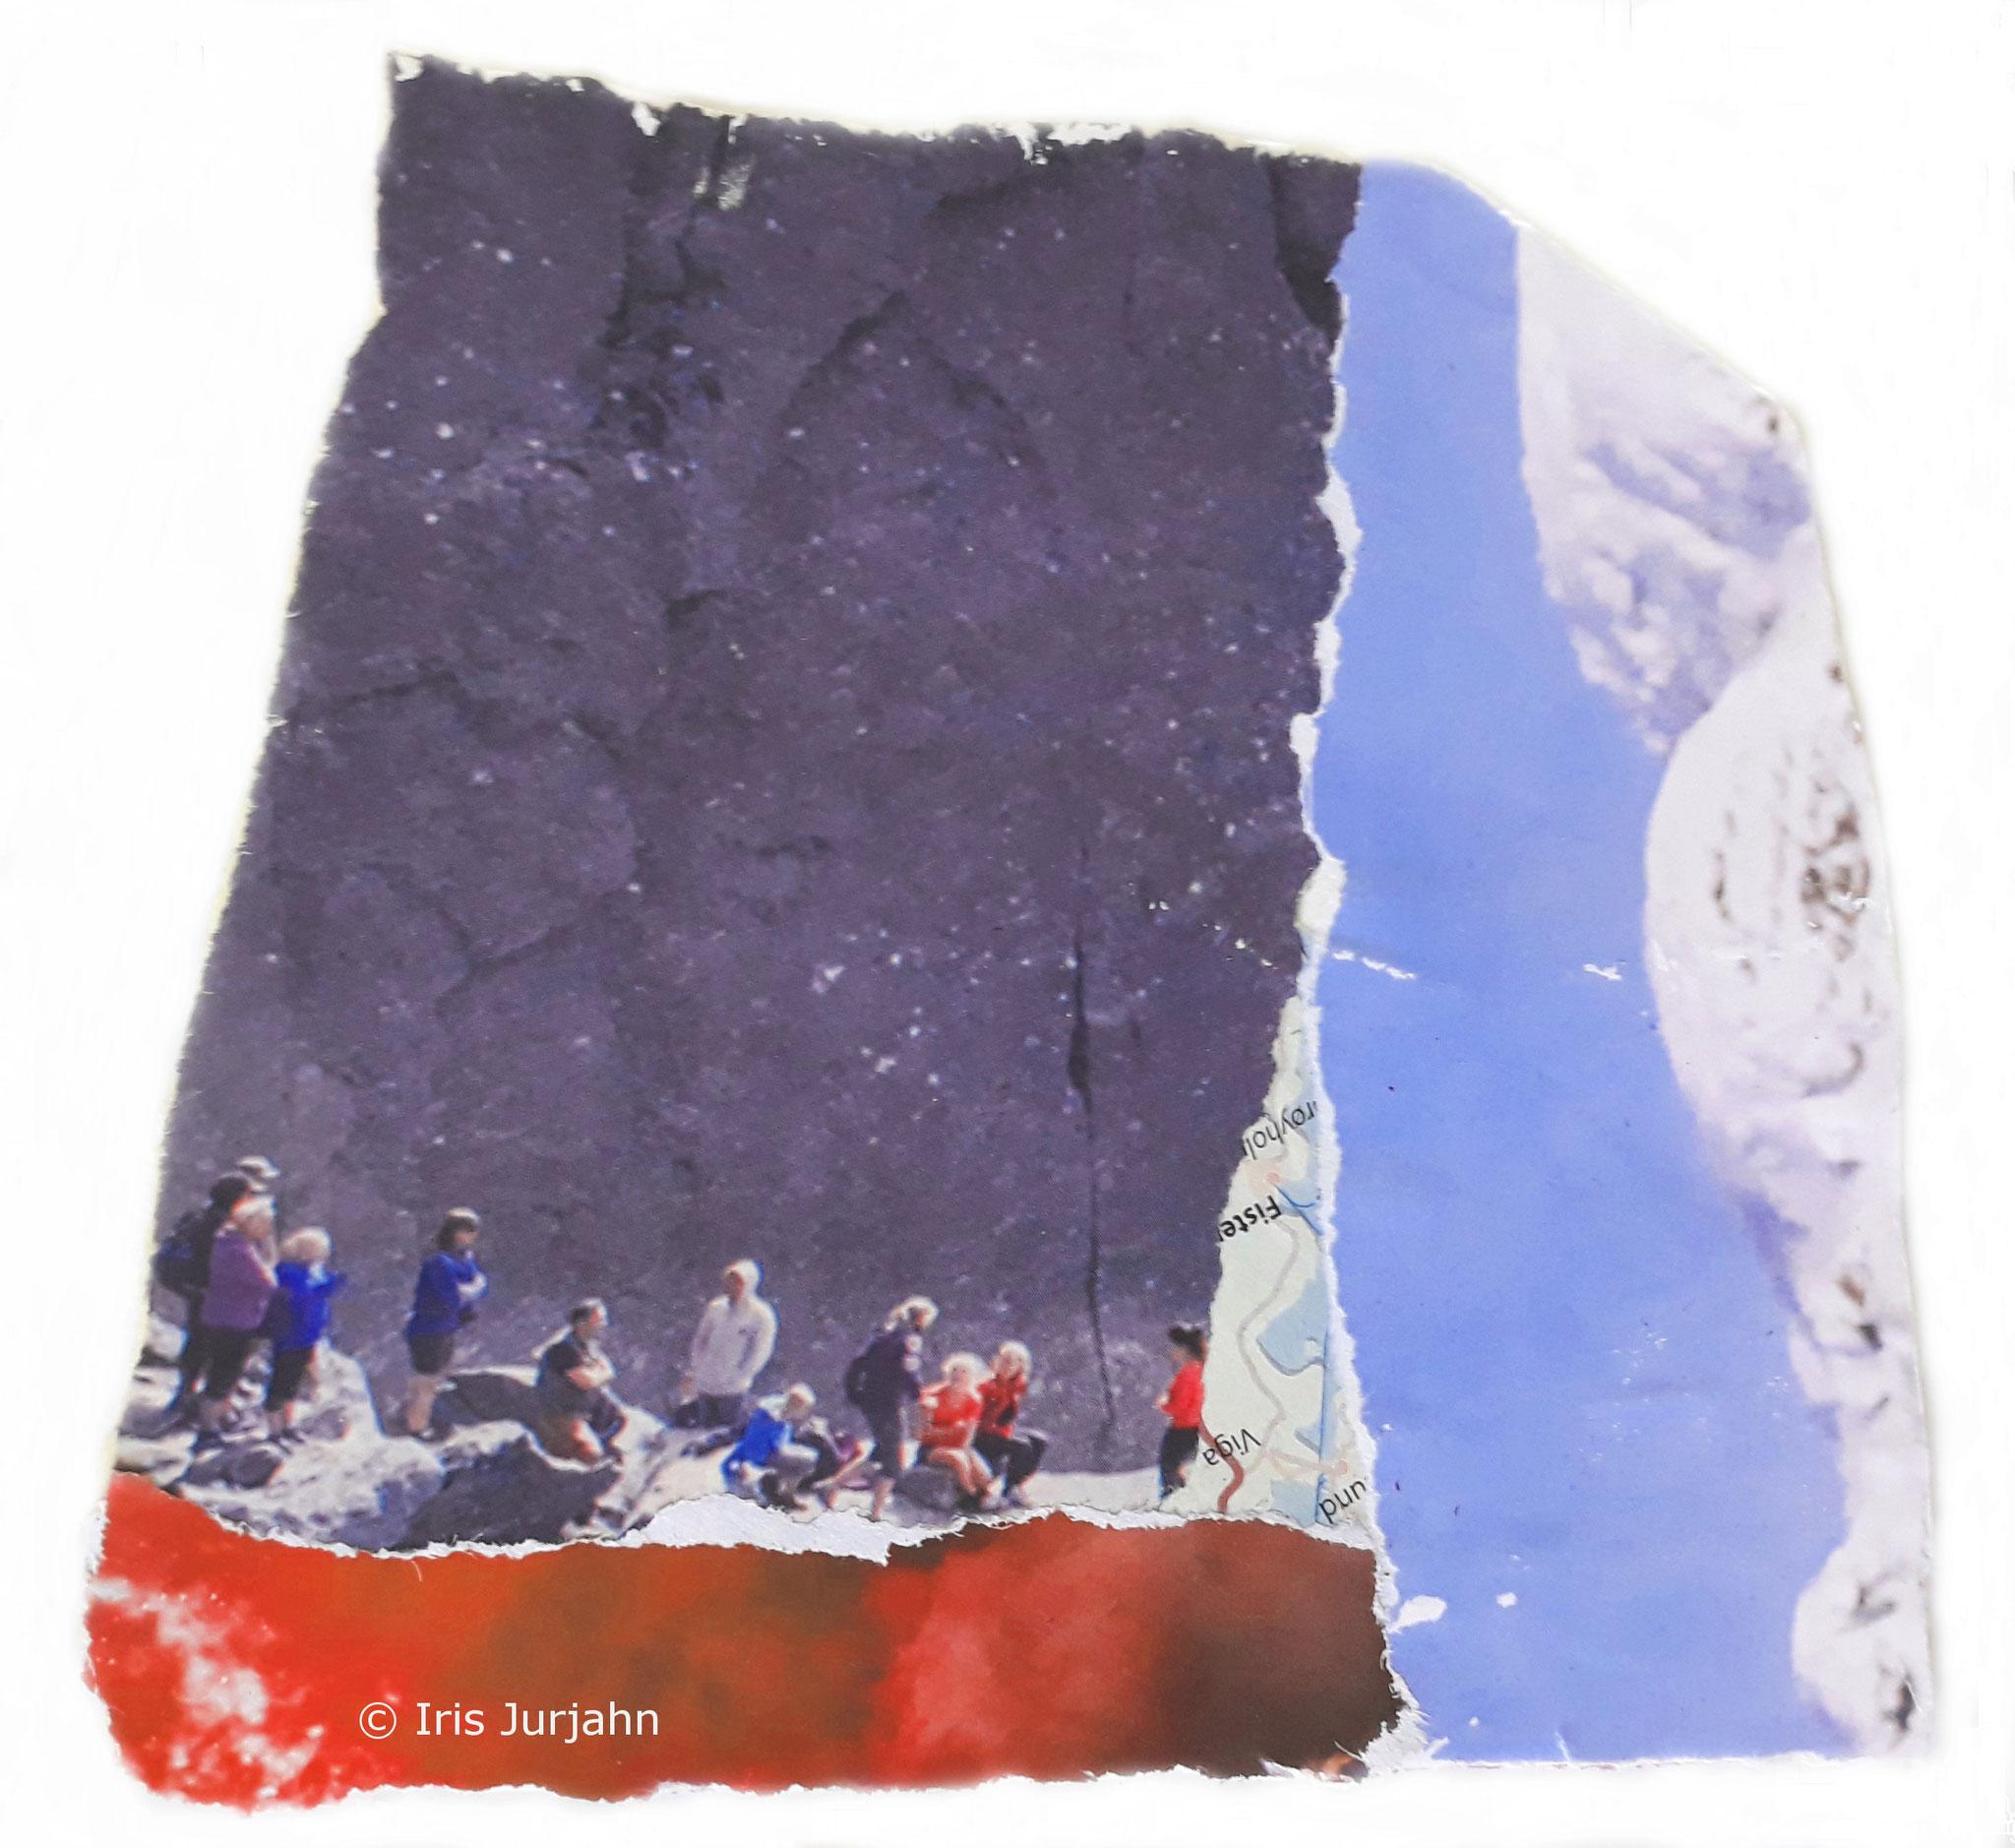 Eisberg, Papiercollage, 17,5 x 17,5 cm (inkl. Objektrahmen), 2017